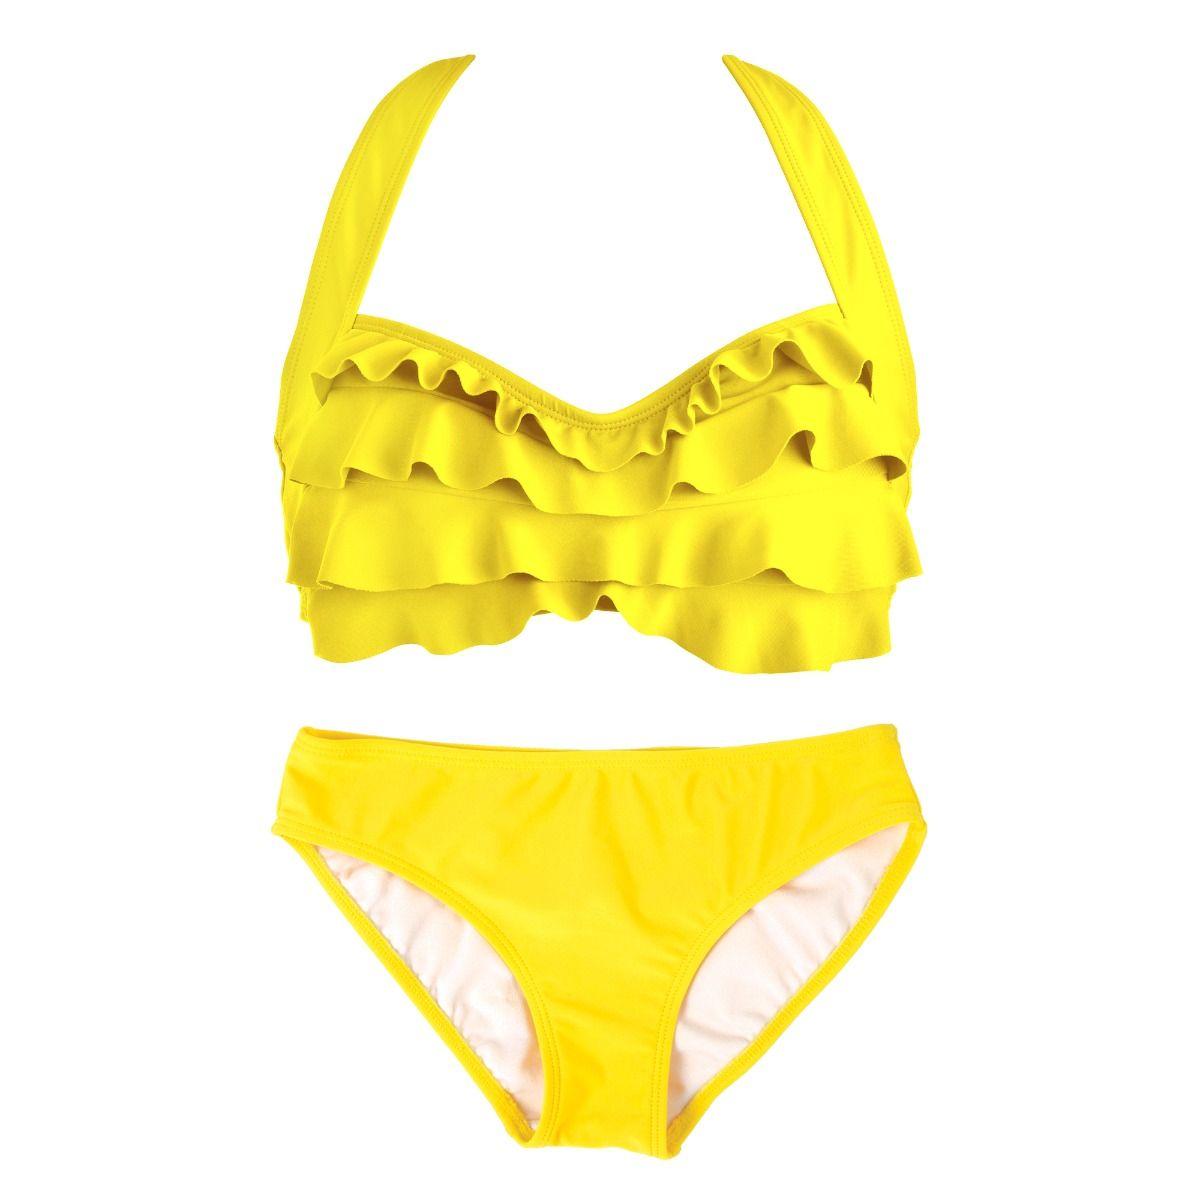 3652cc8b76d Yellow Sea Wave Bikini Swimset for Girls & Women  By Fin Fun